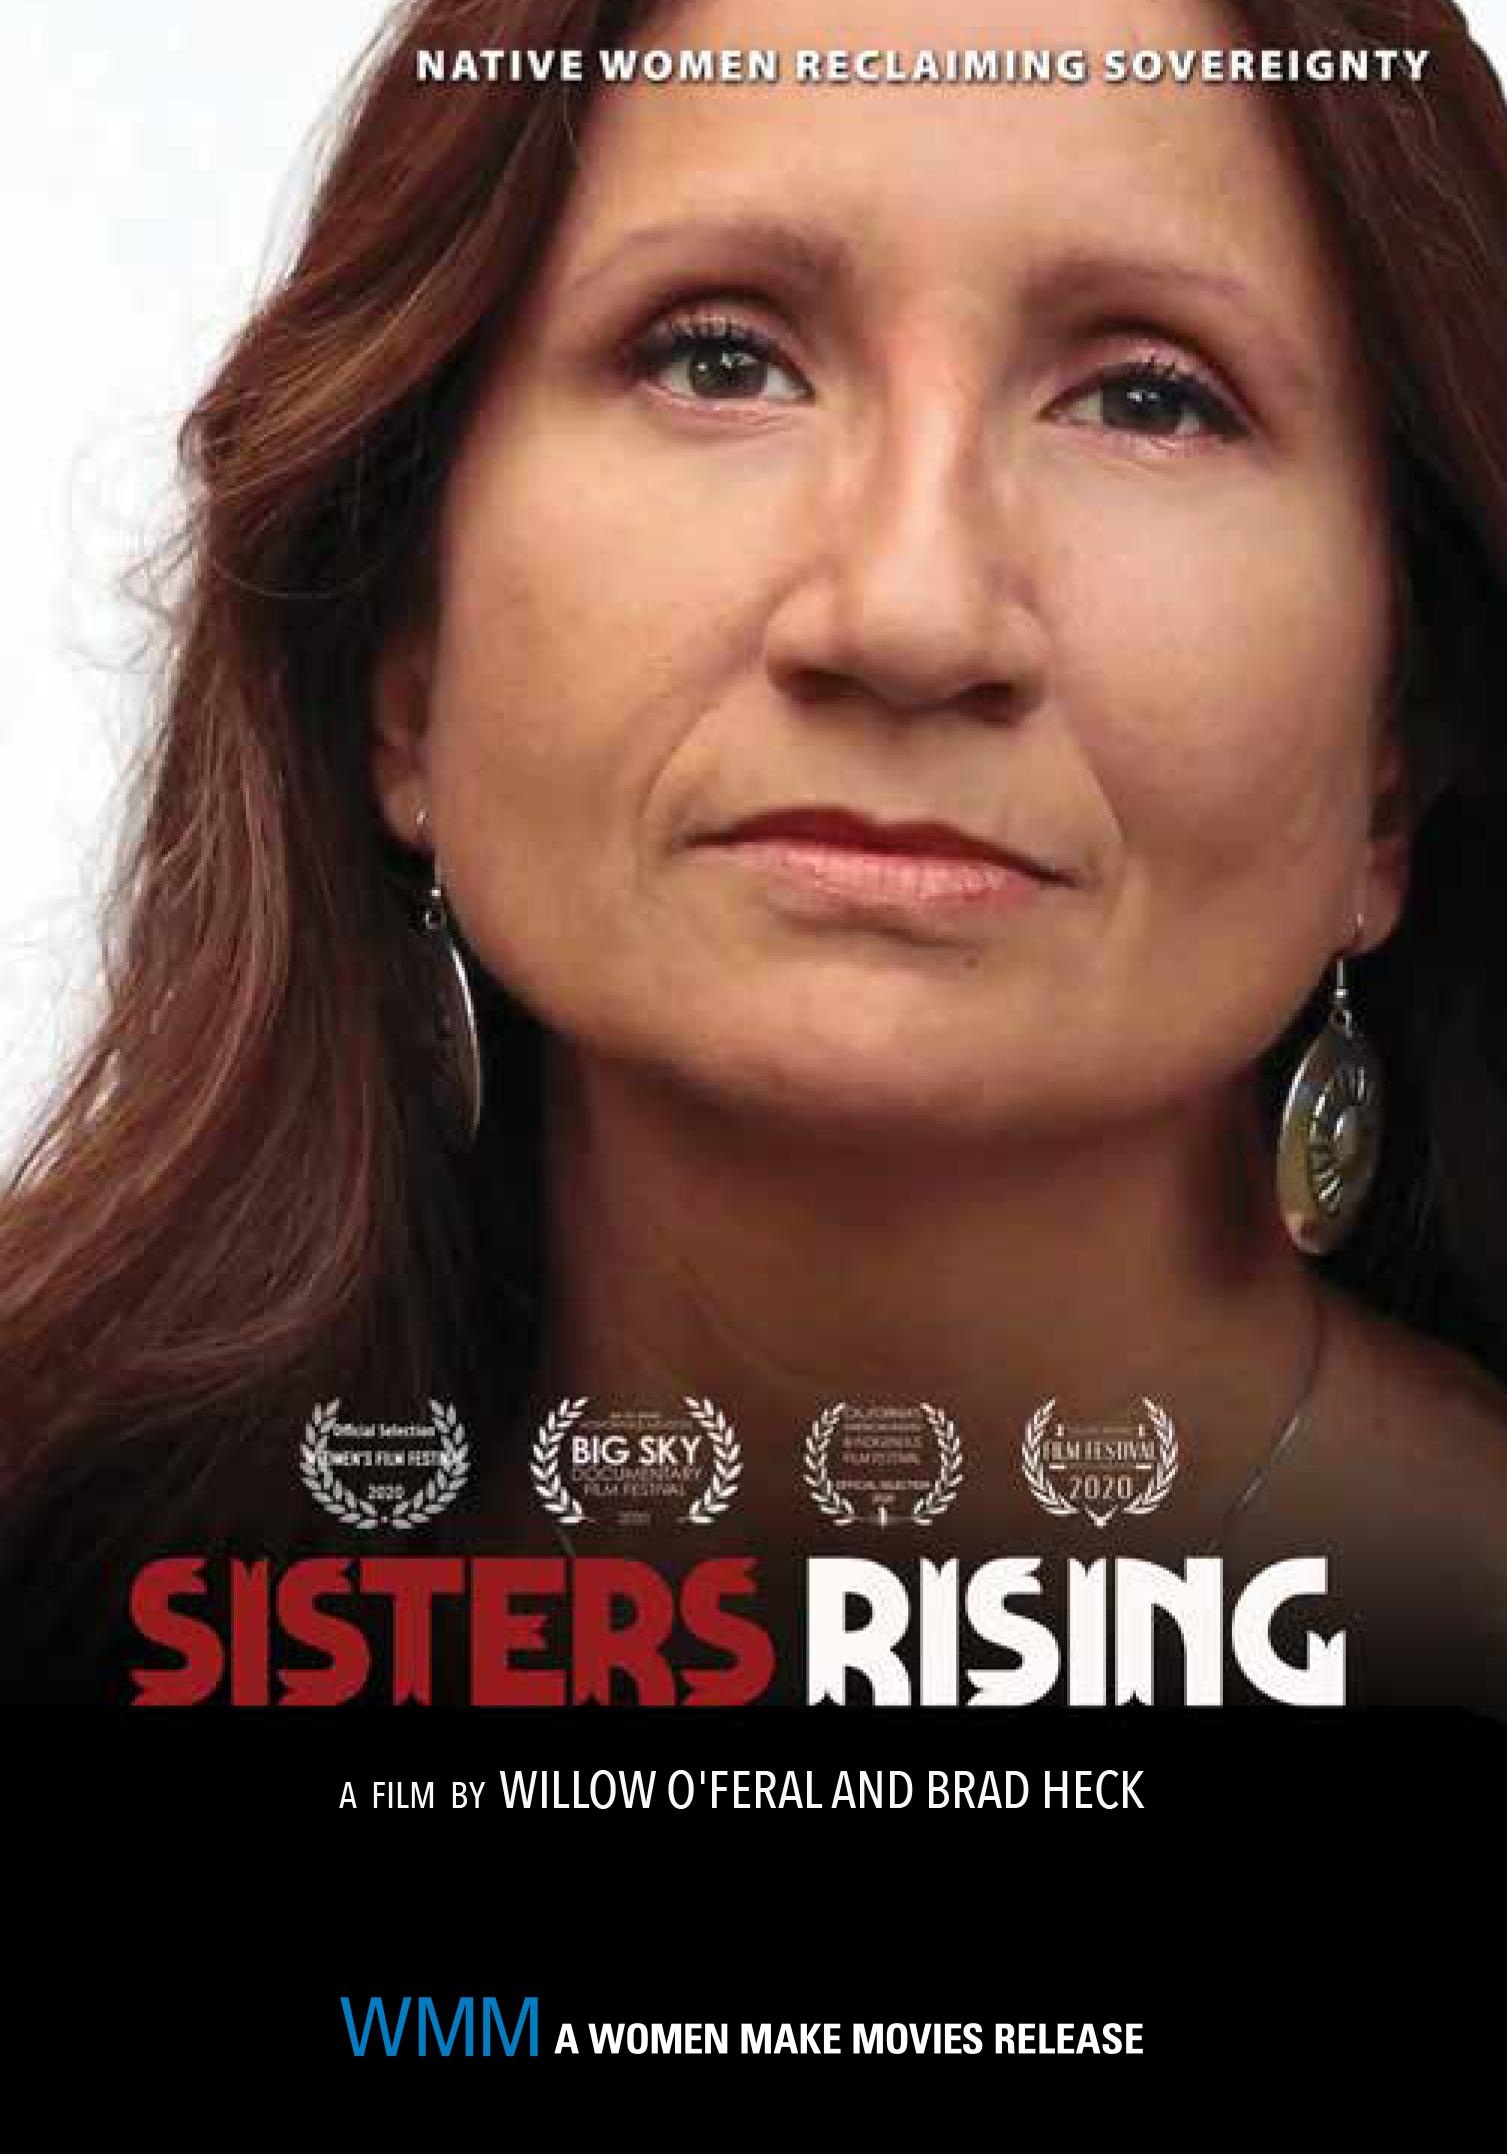 Sisters Rising Amaray 4.2.20 OPT 1